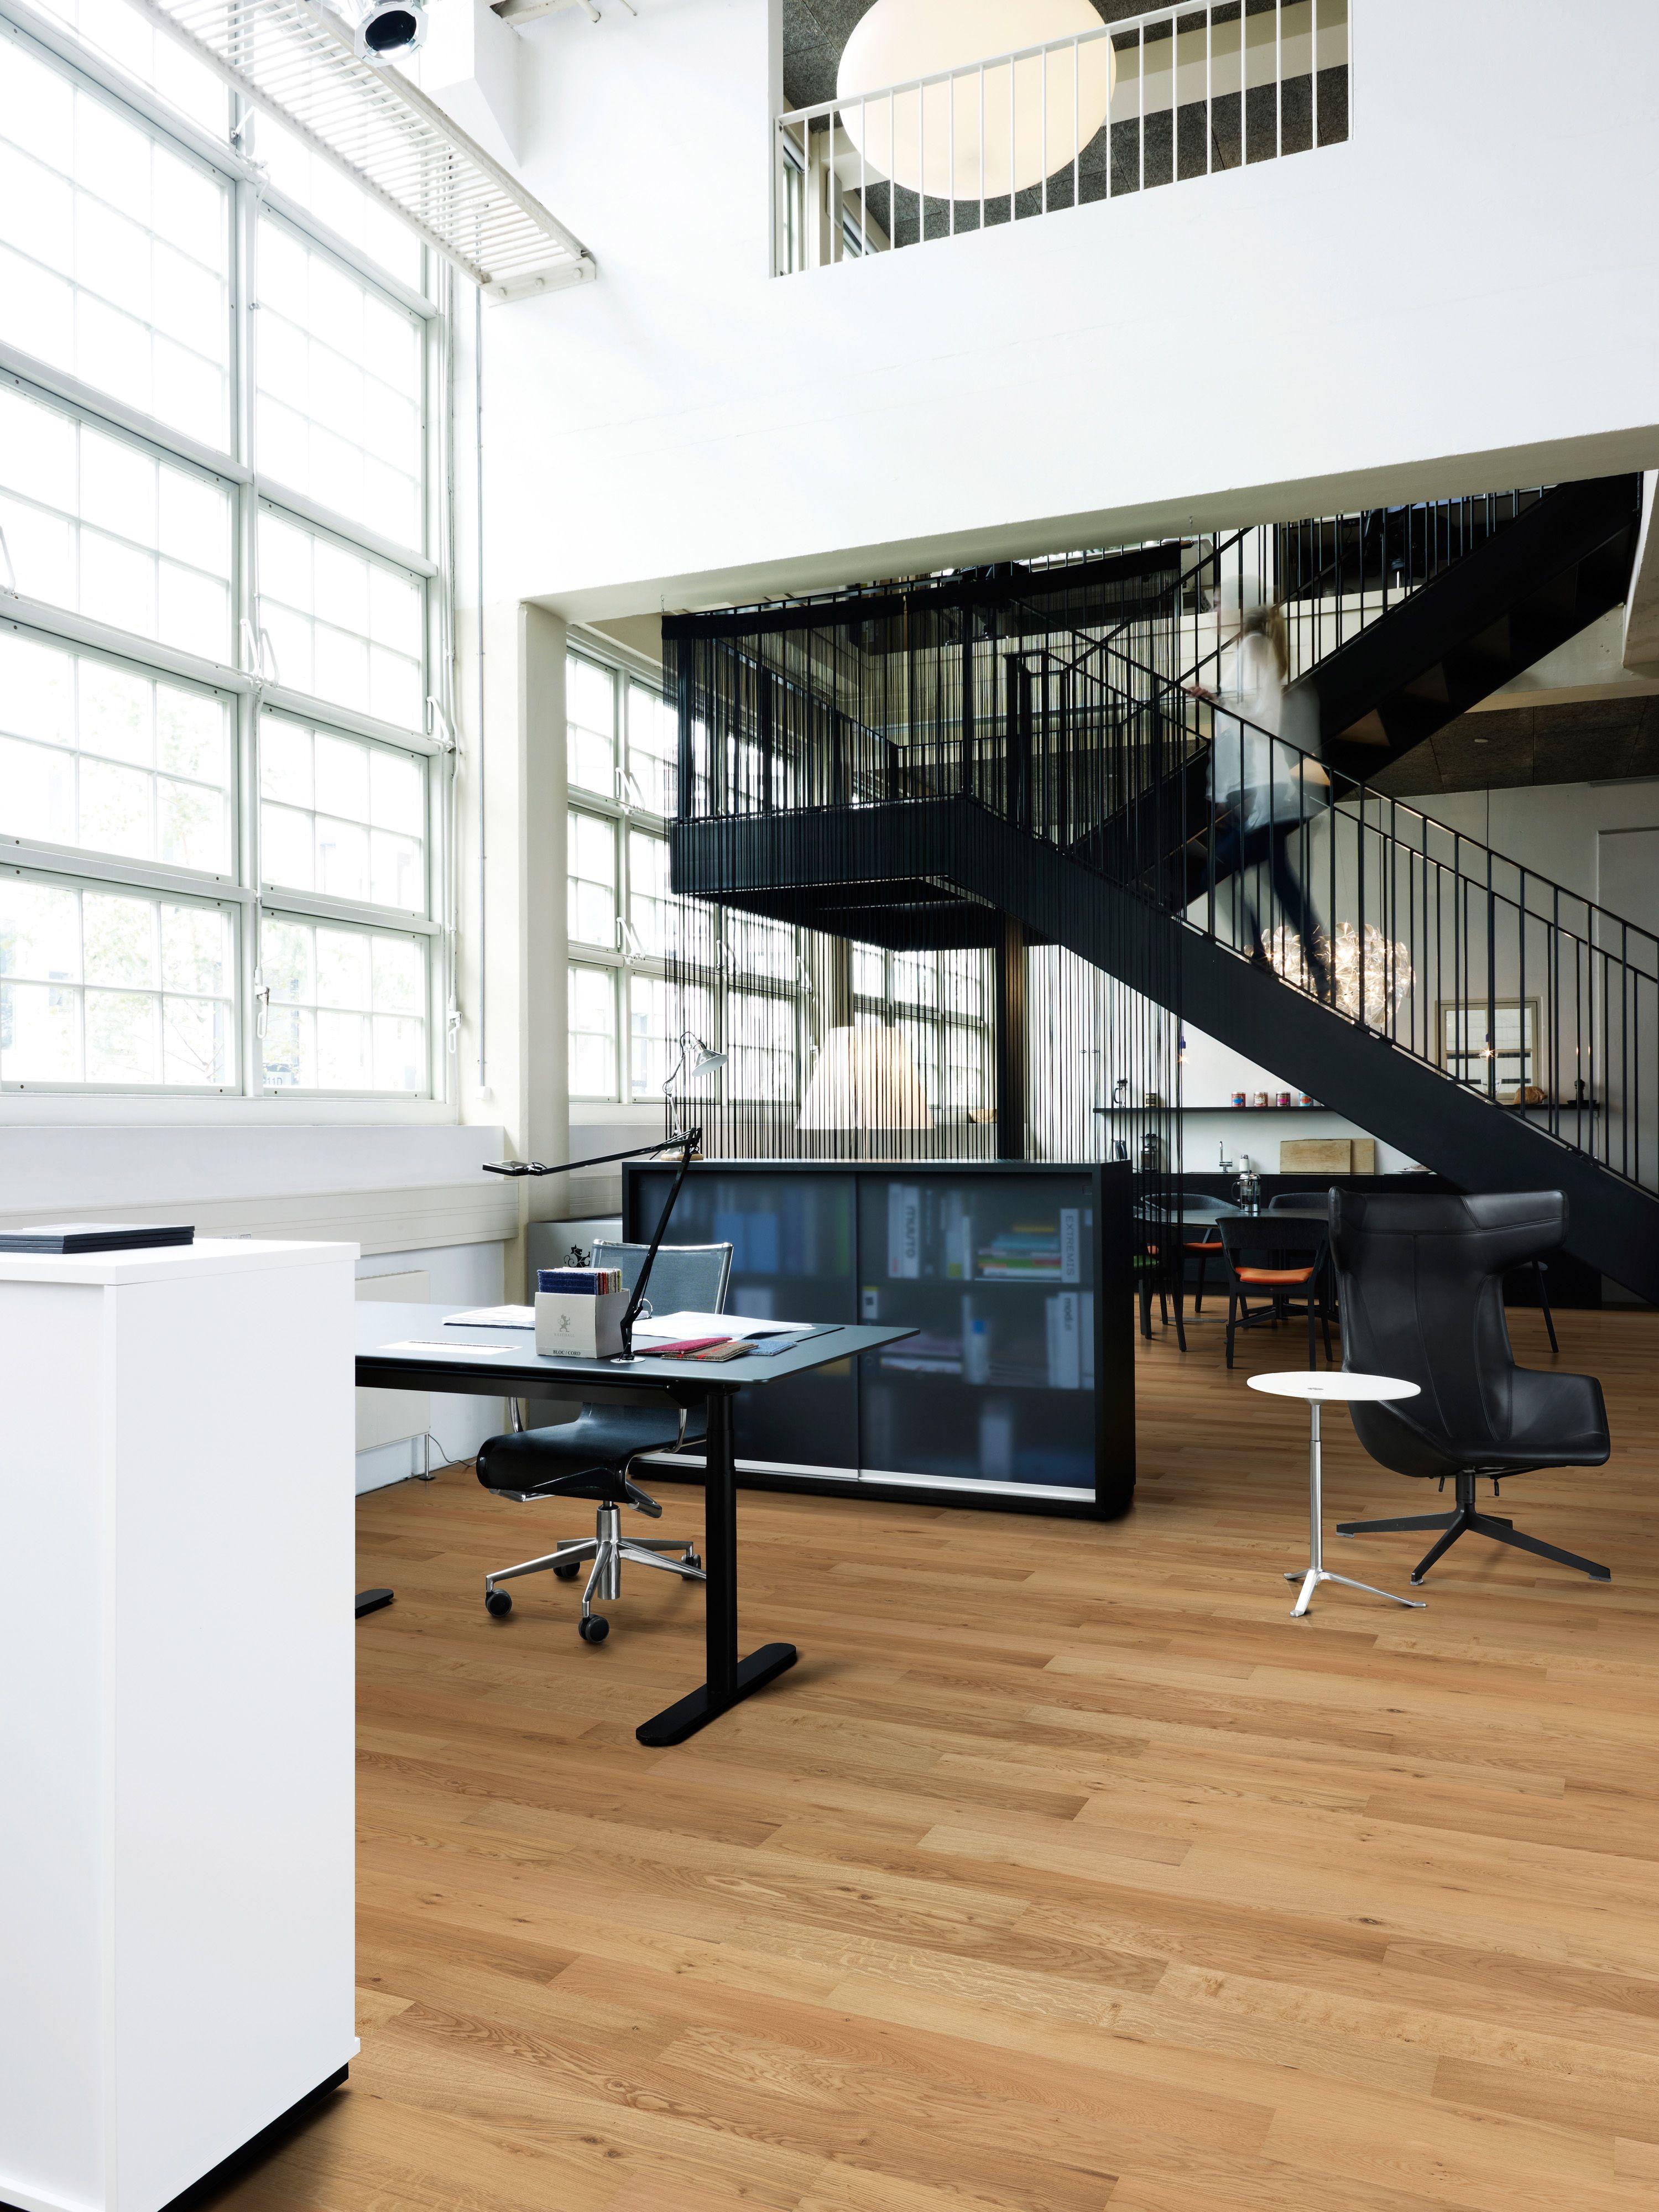 2-Stab Kollektionen von Kährs Parkett passt perfekt zum Büro | Mehr ...